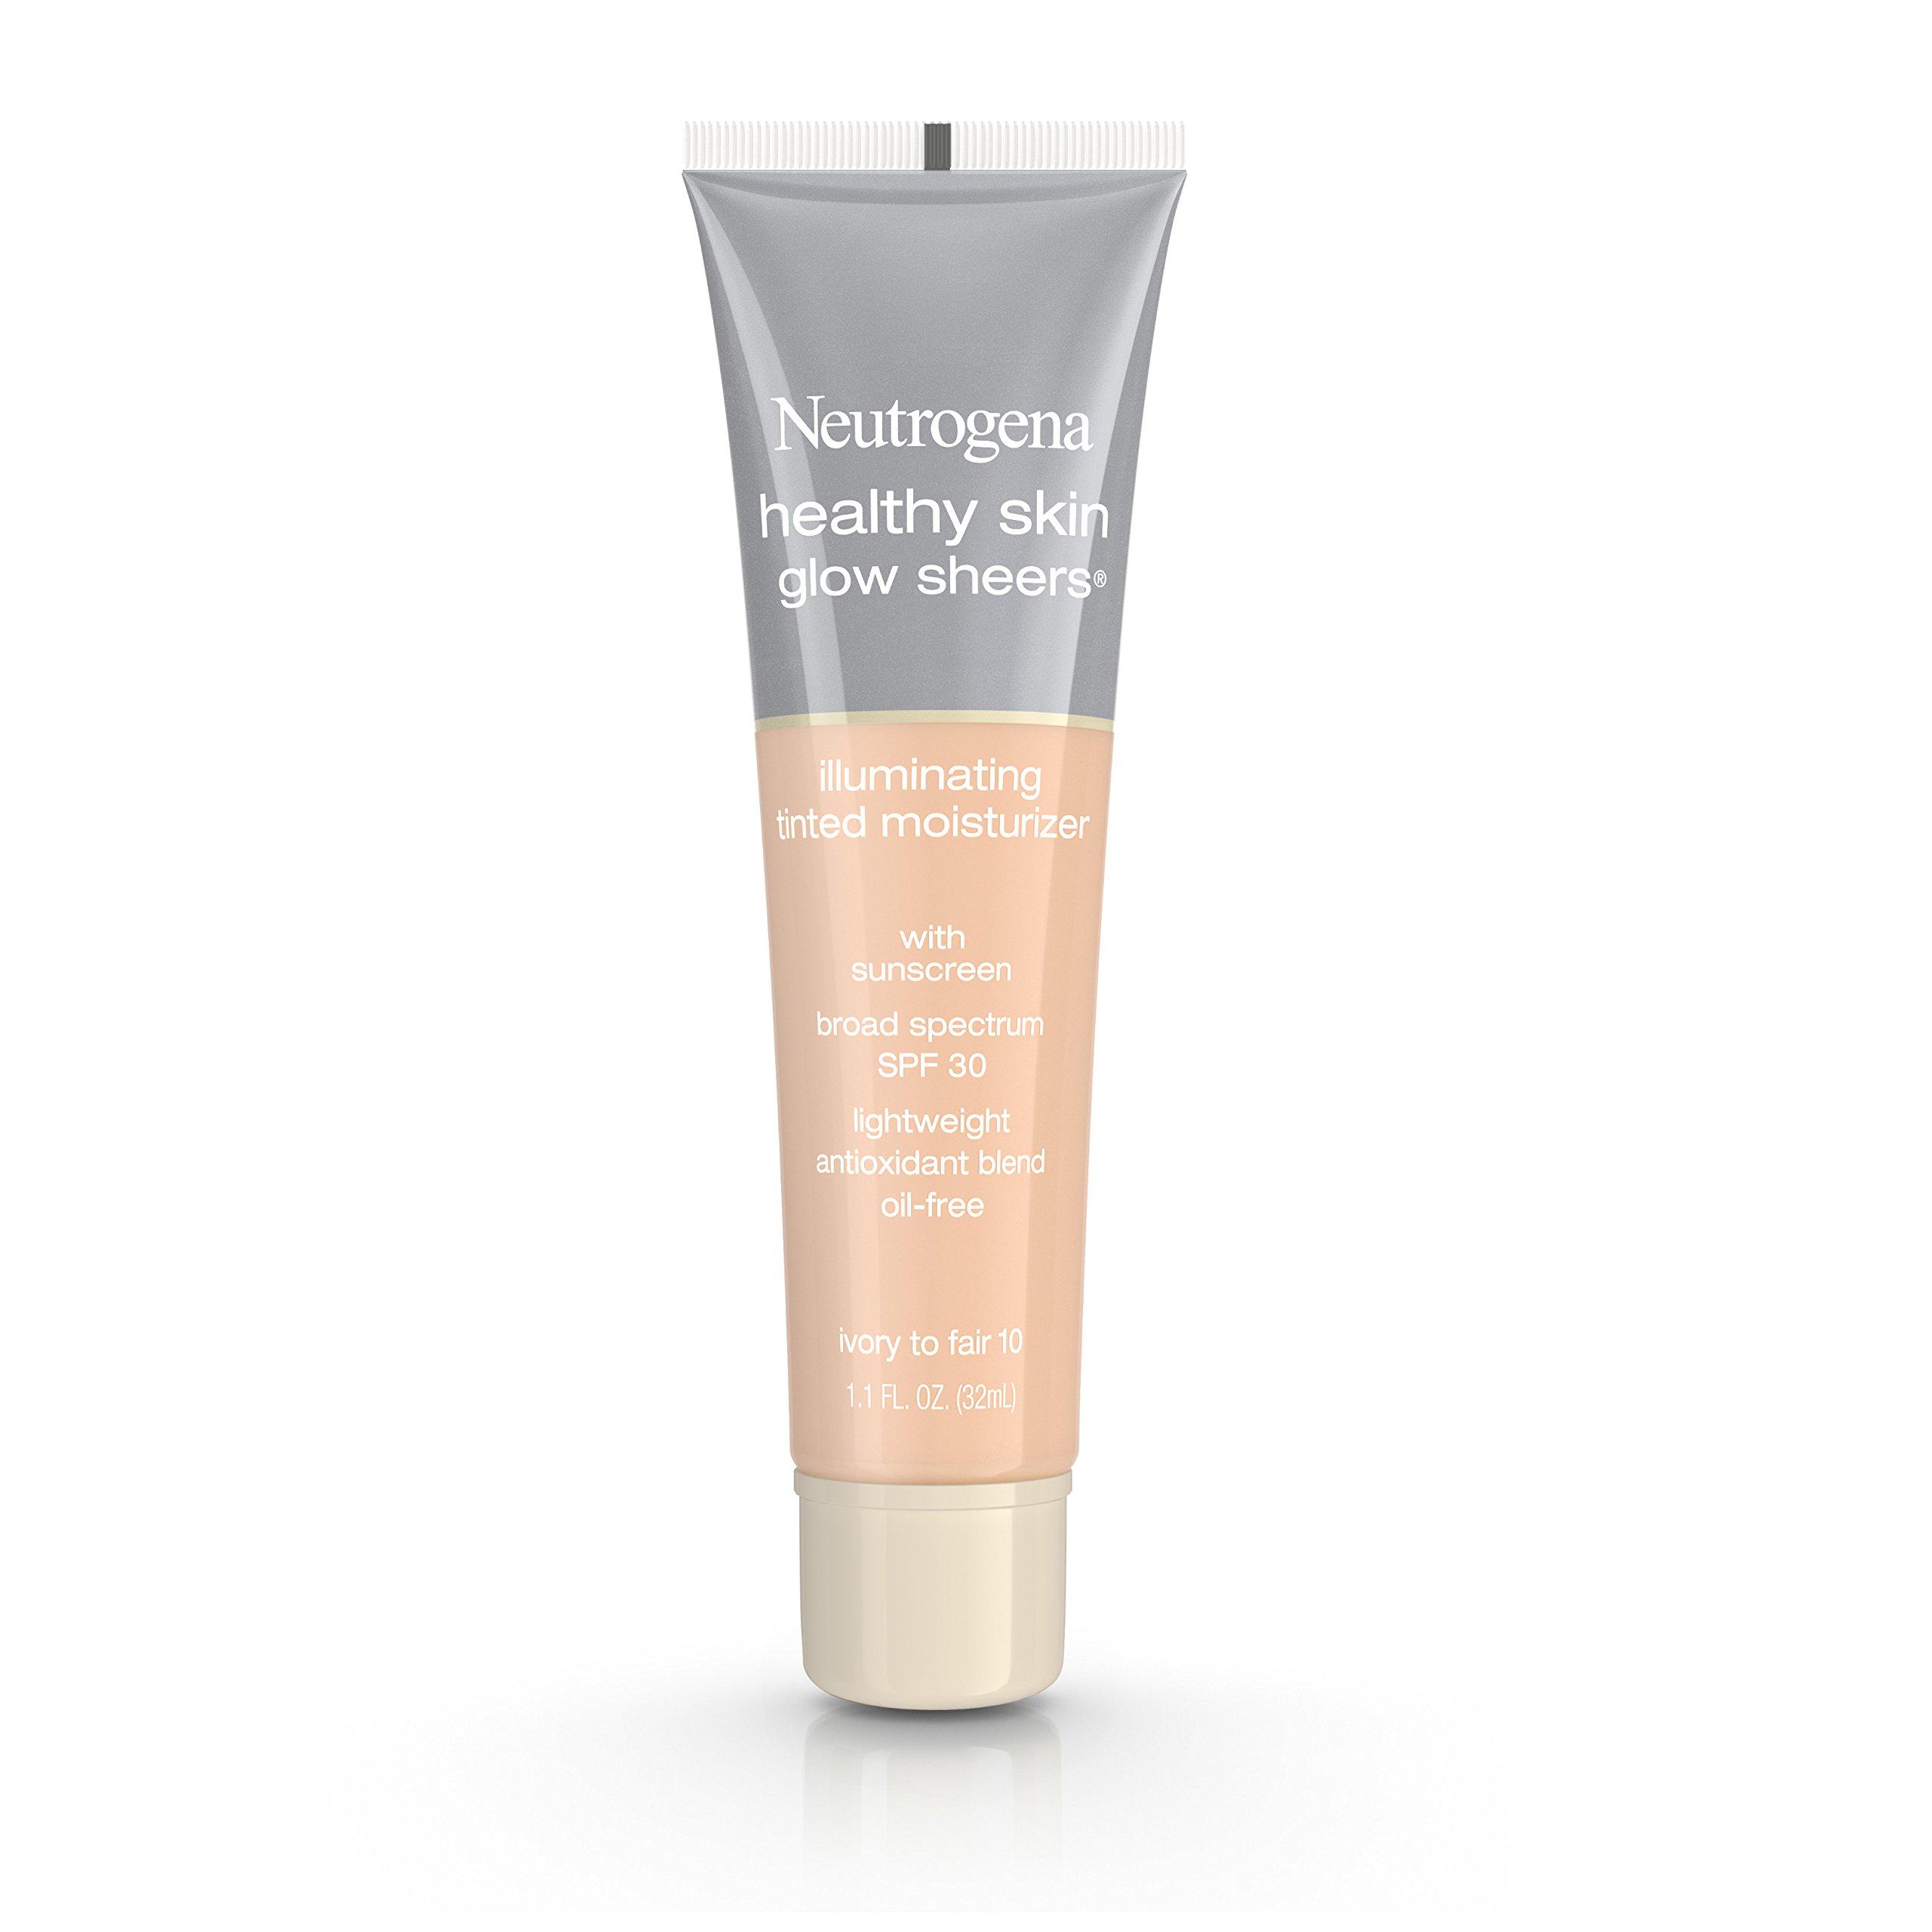 Neutrogena Healthy Skin Glow Sheers Broad Spectrum Spf 30, Ivory To Fair 10, 1.1 Oz.